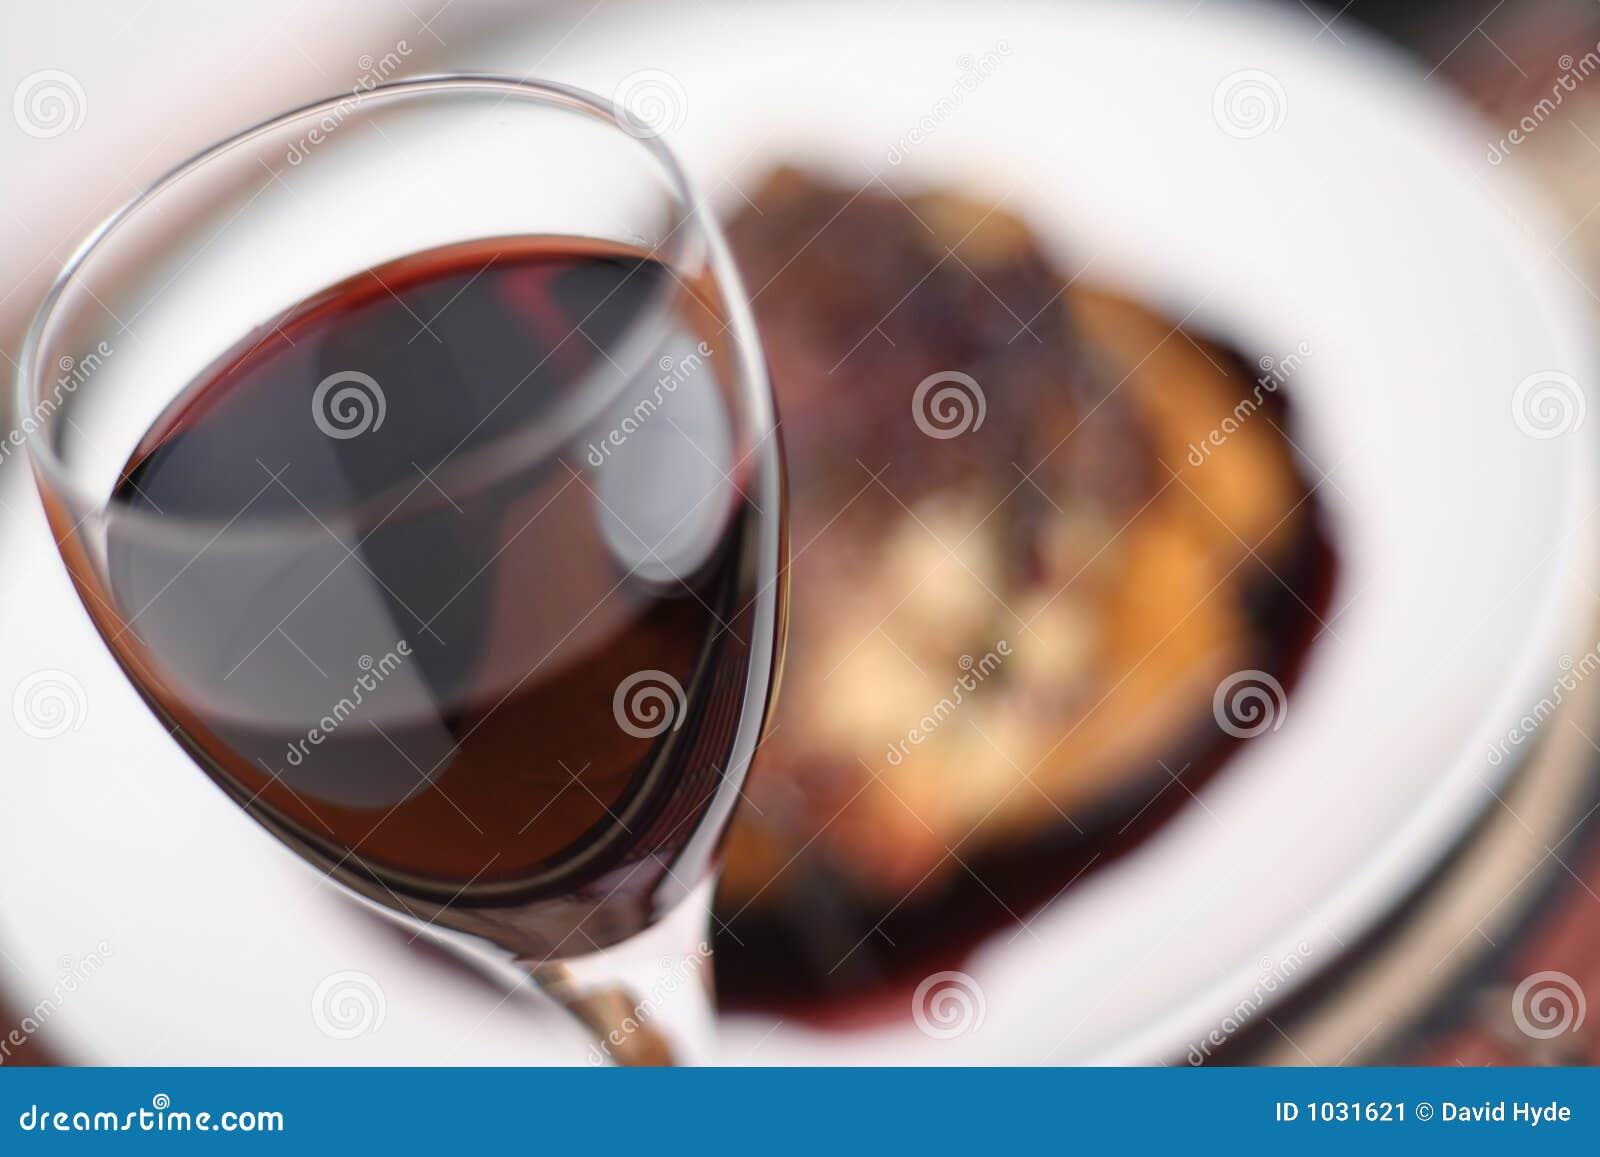 Dîner de vin rouge ; vue large d orientation molle